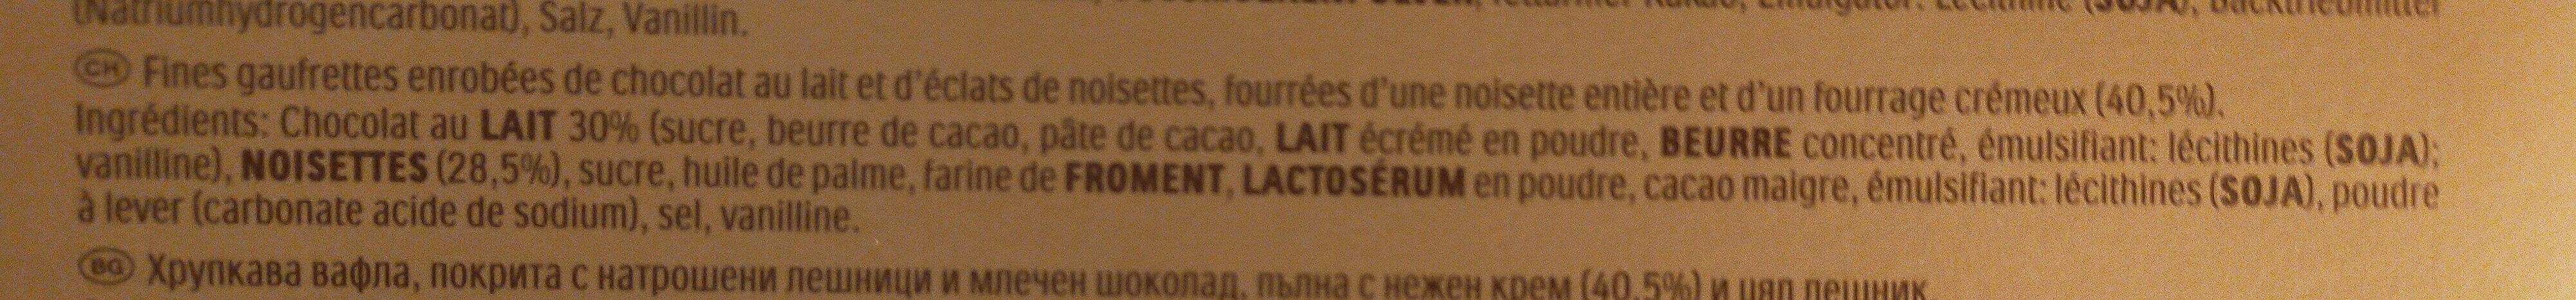 Rocher - Ingrediënten - fr